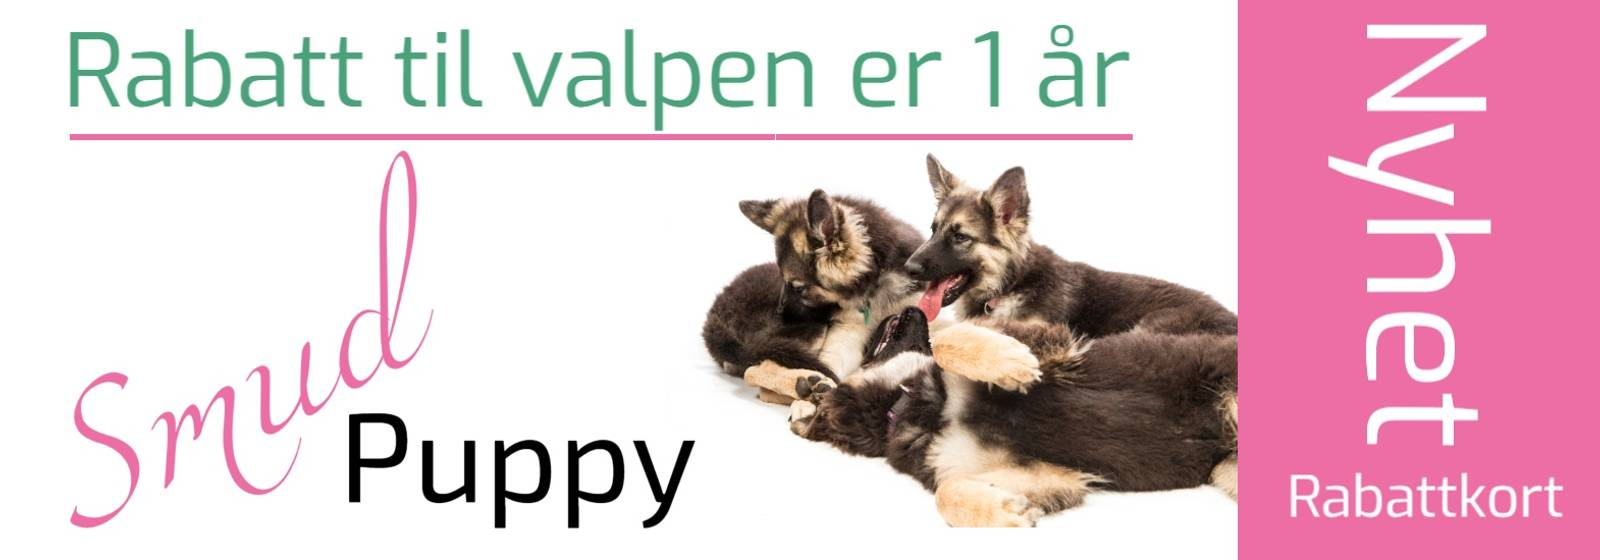 Rabattkode valp SmudPuppy Rabattkort på hundeutstyr og hundemat